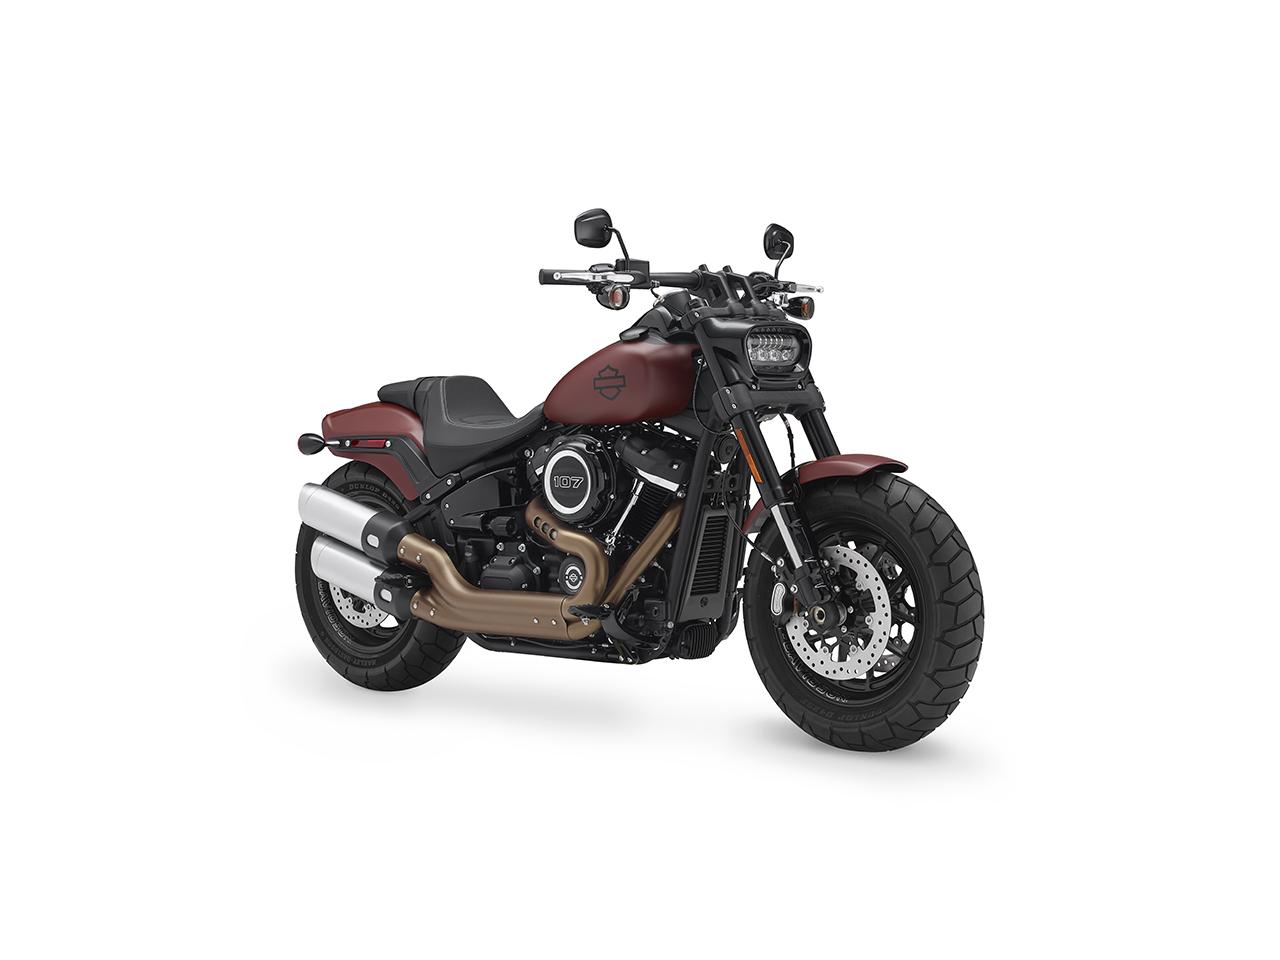 2018 Harley-Davidson Fat Bob Image